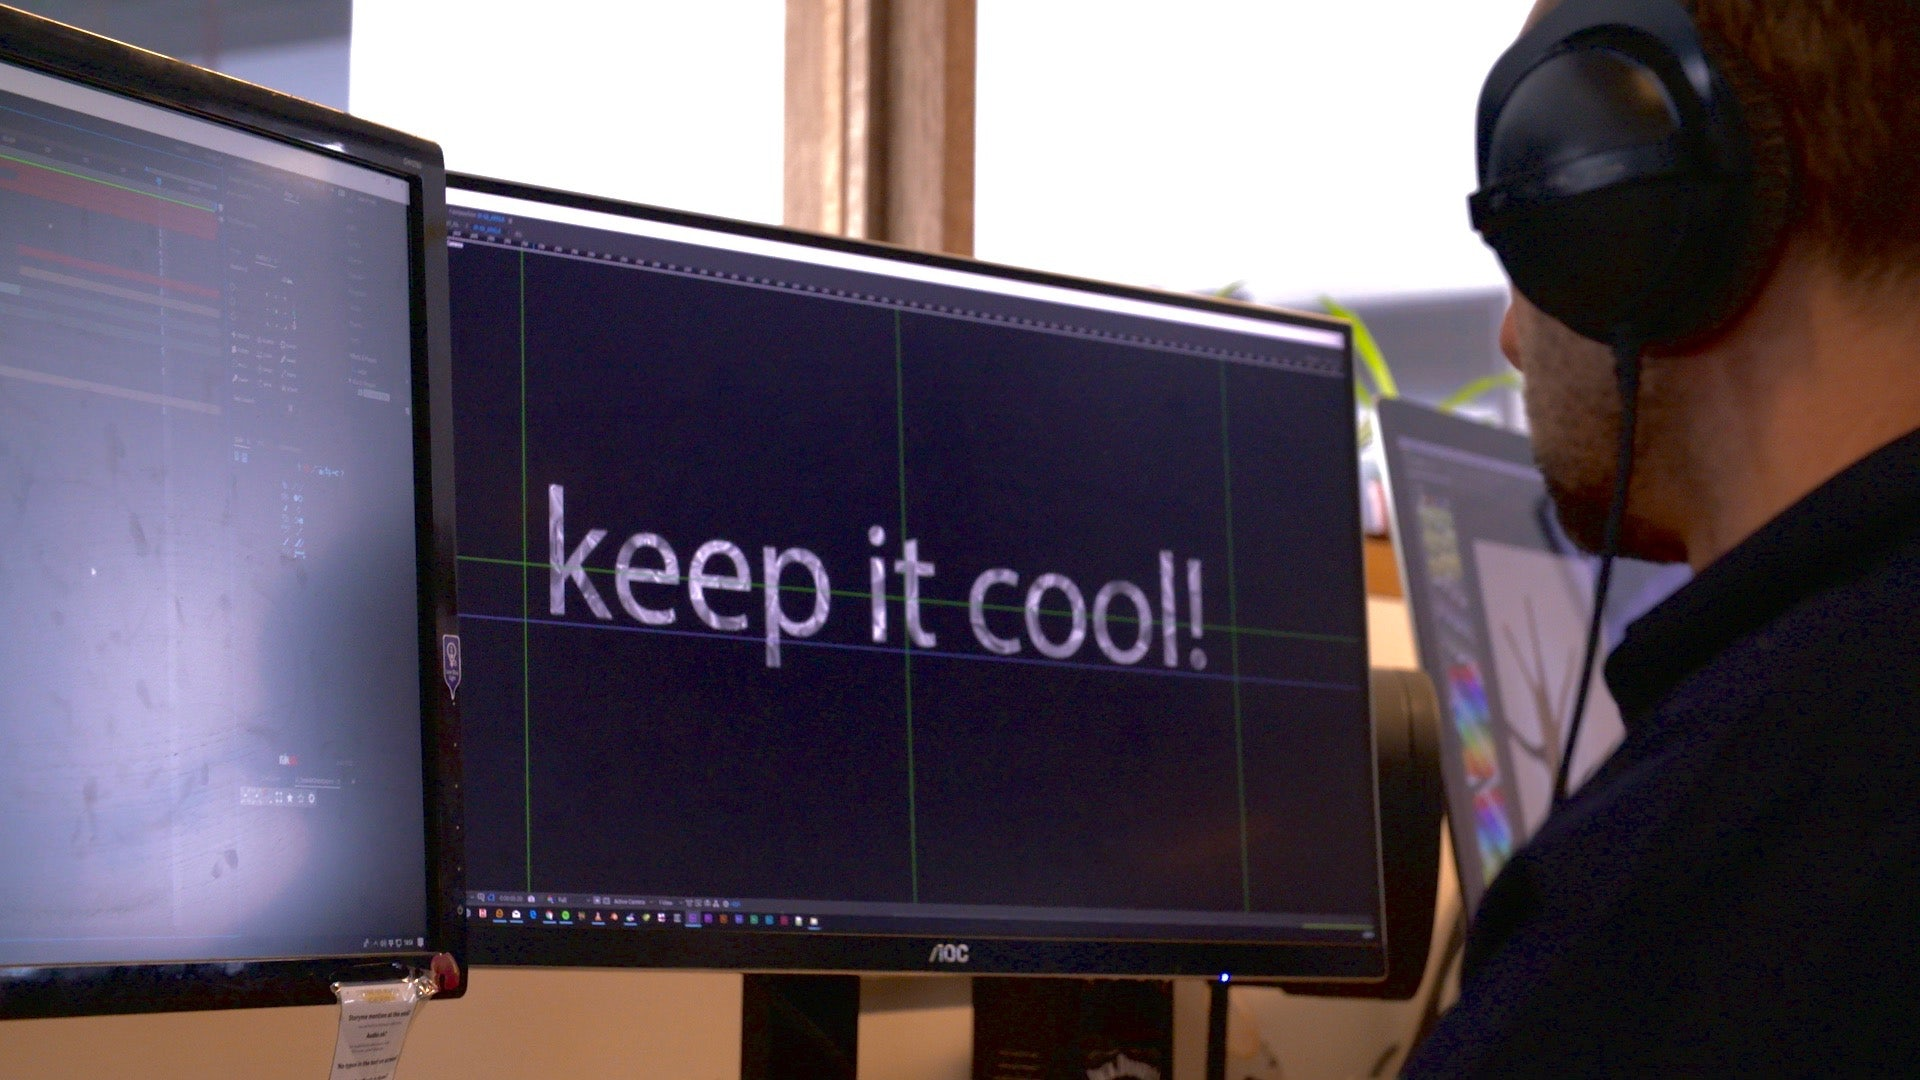 Keep it cool!